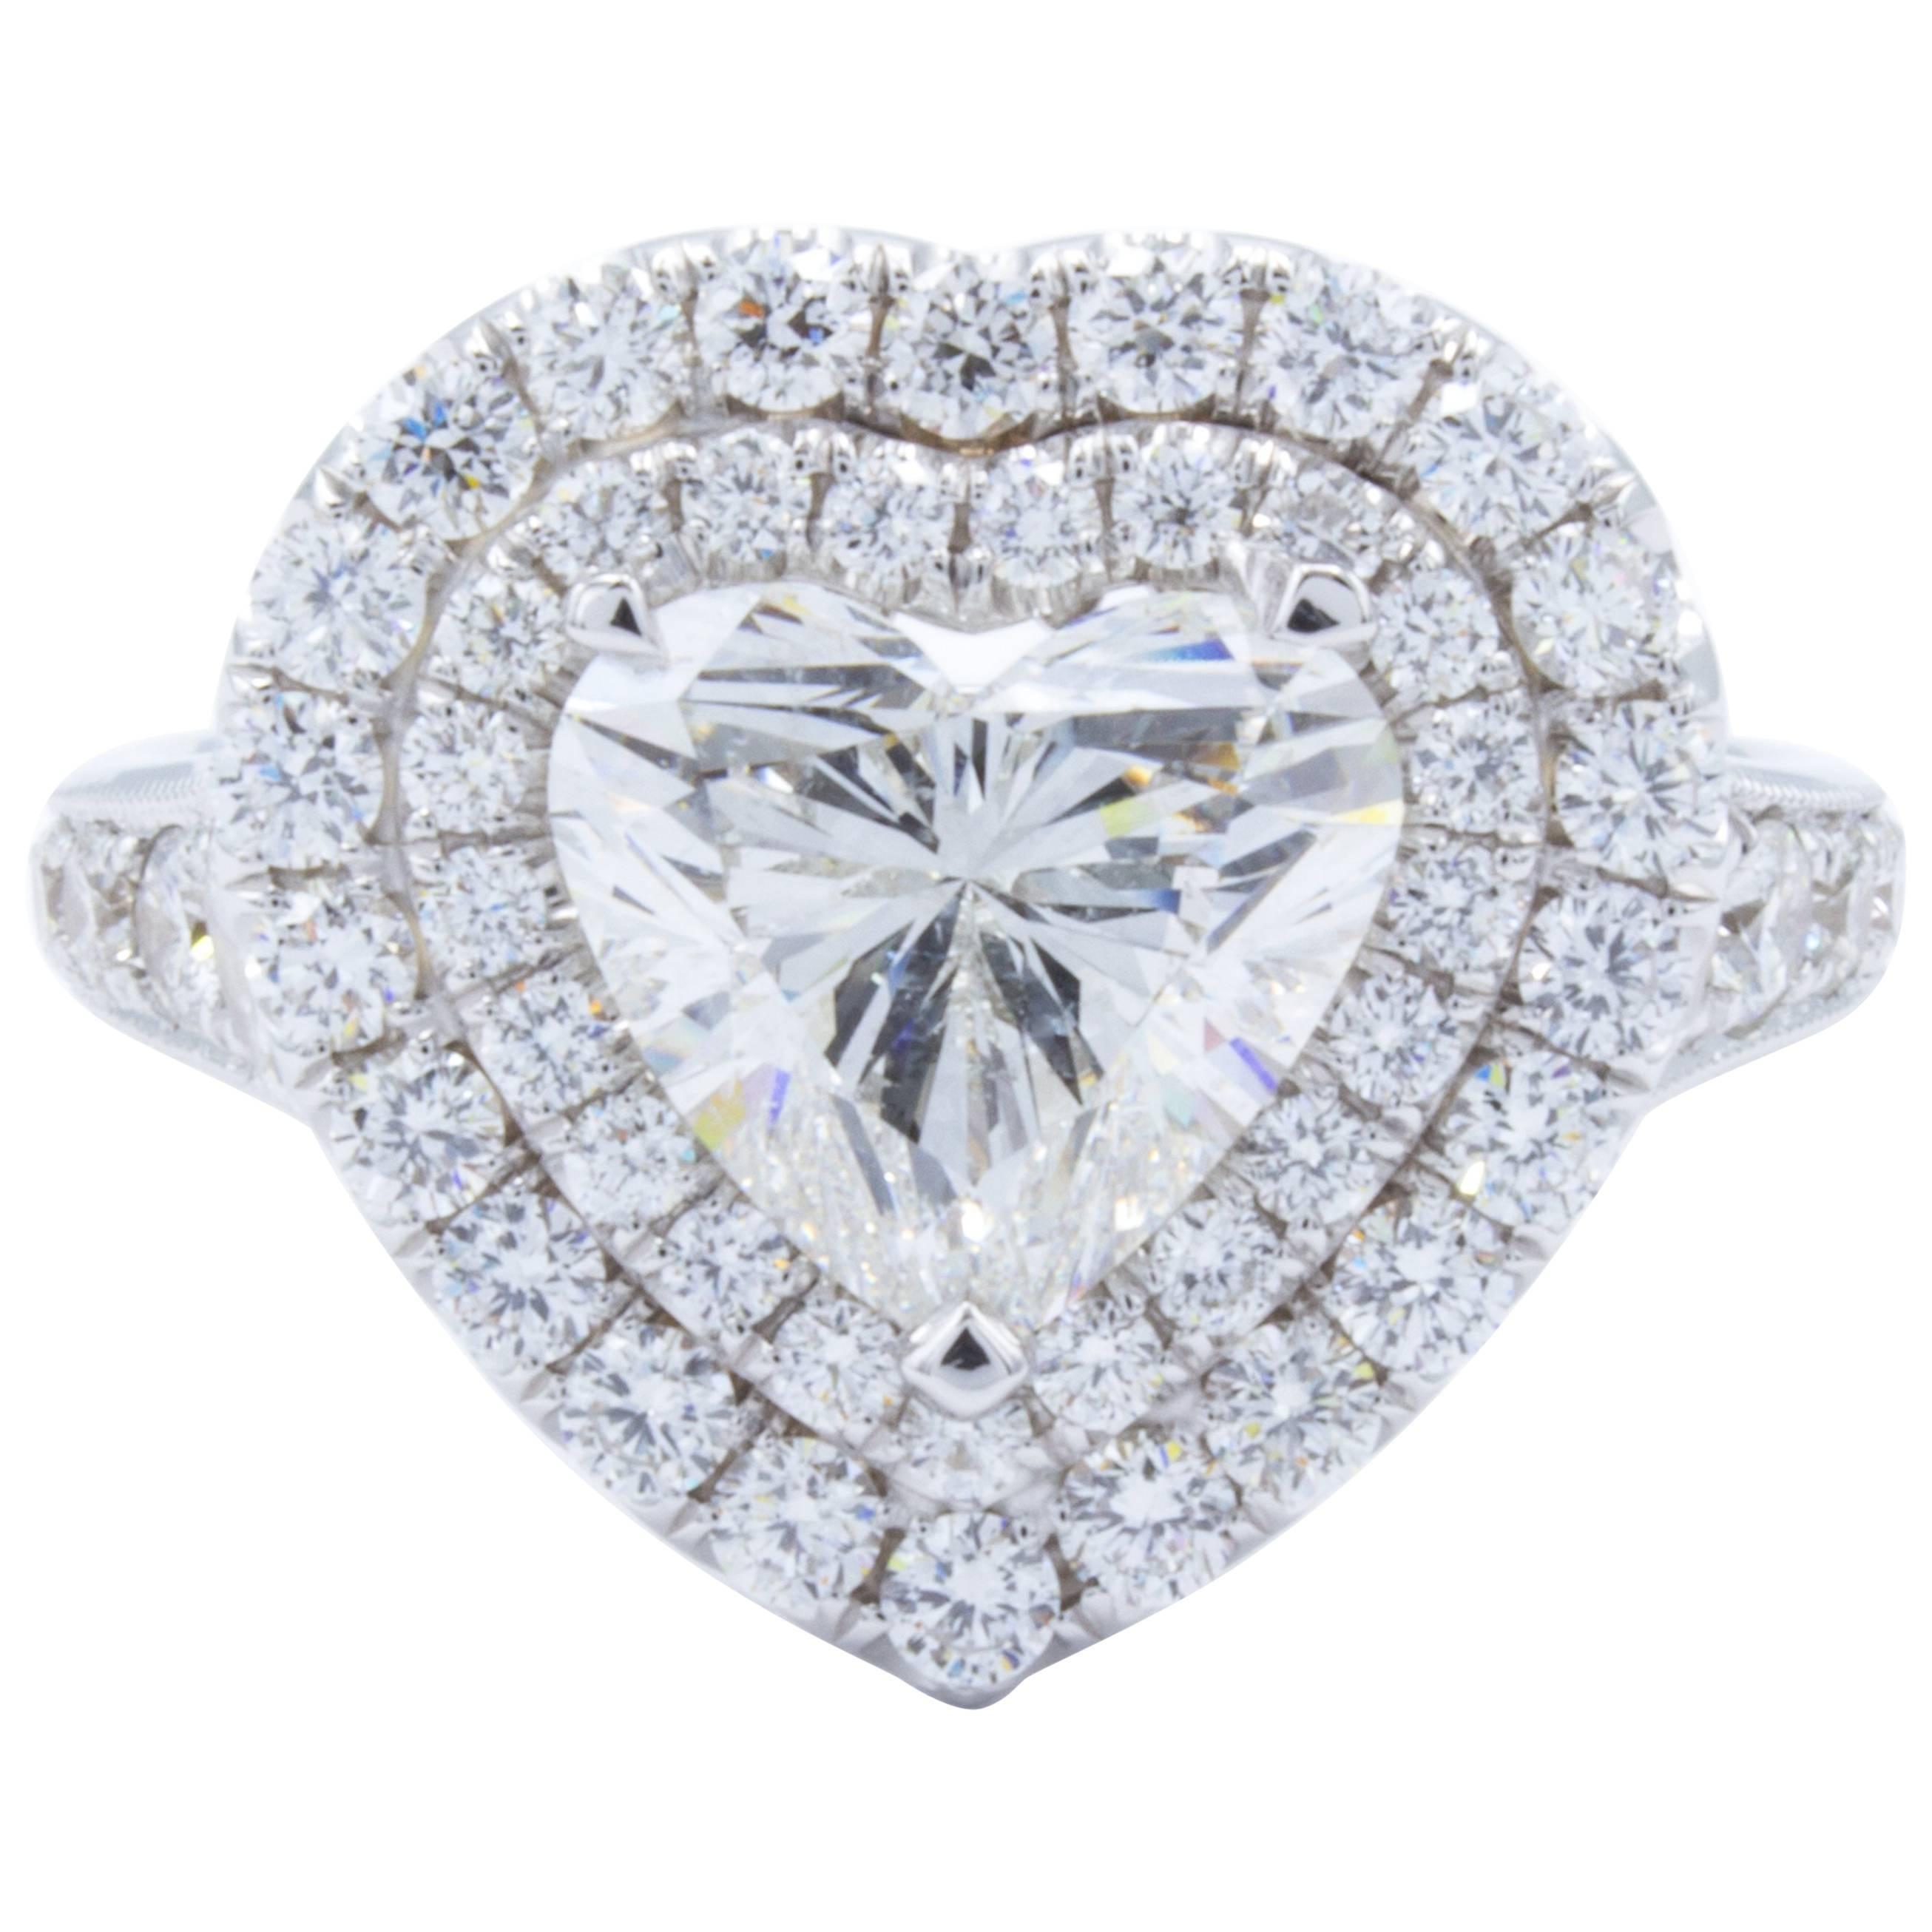 David Rosenberg 2.01 Carat Heart Shape Halo G/SI2 GIA Engagement Diamond Ring